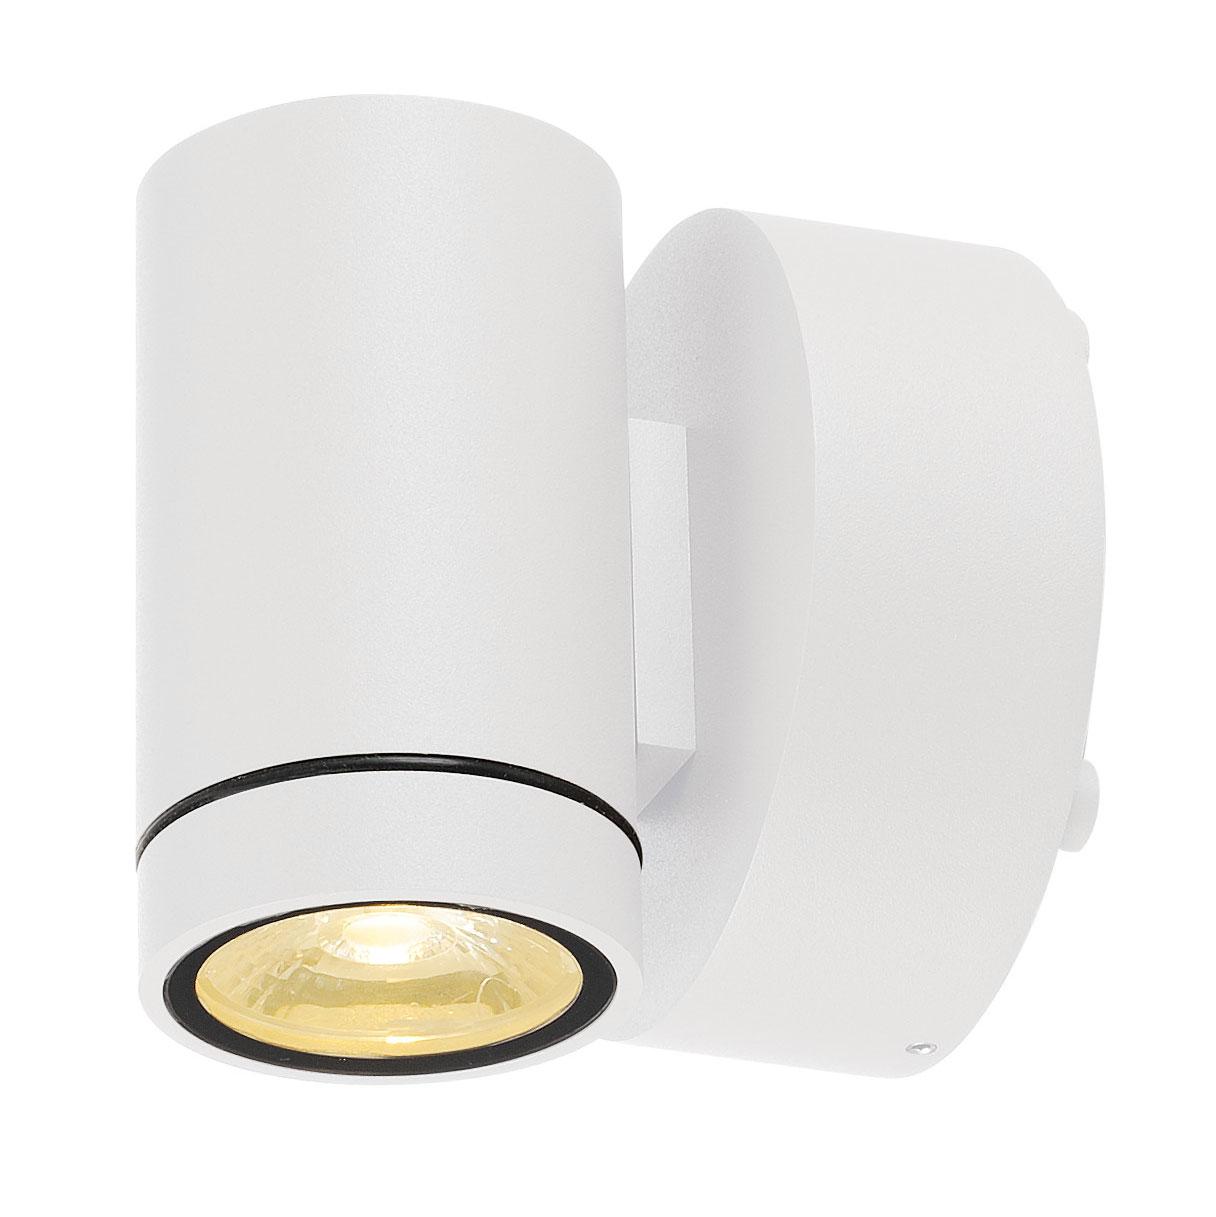 Bellalite Helia Downlight Vit Utelampa LED